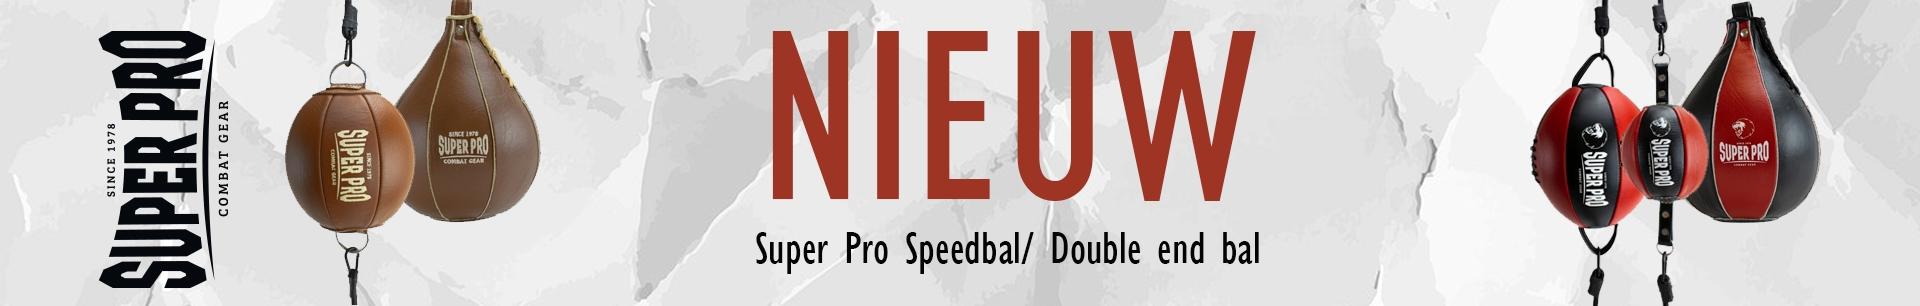 Speedbal/Double end bal Super Pro